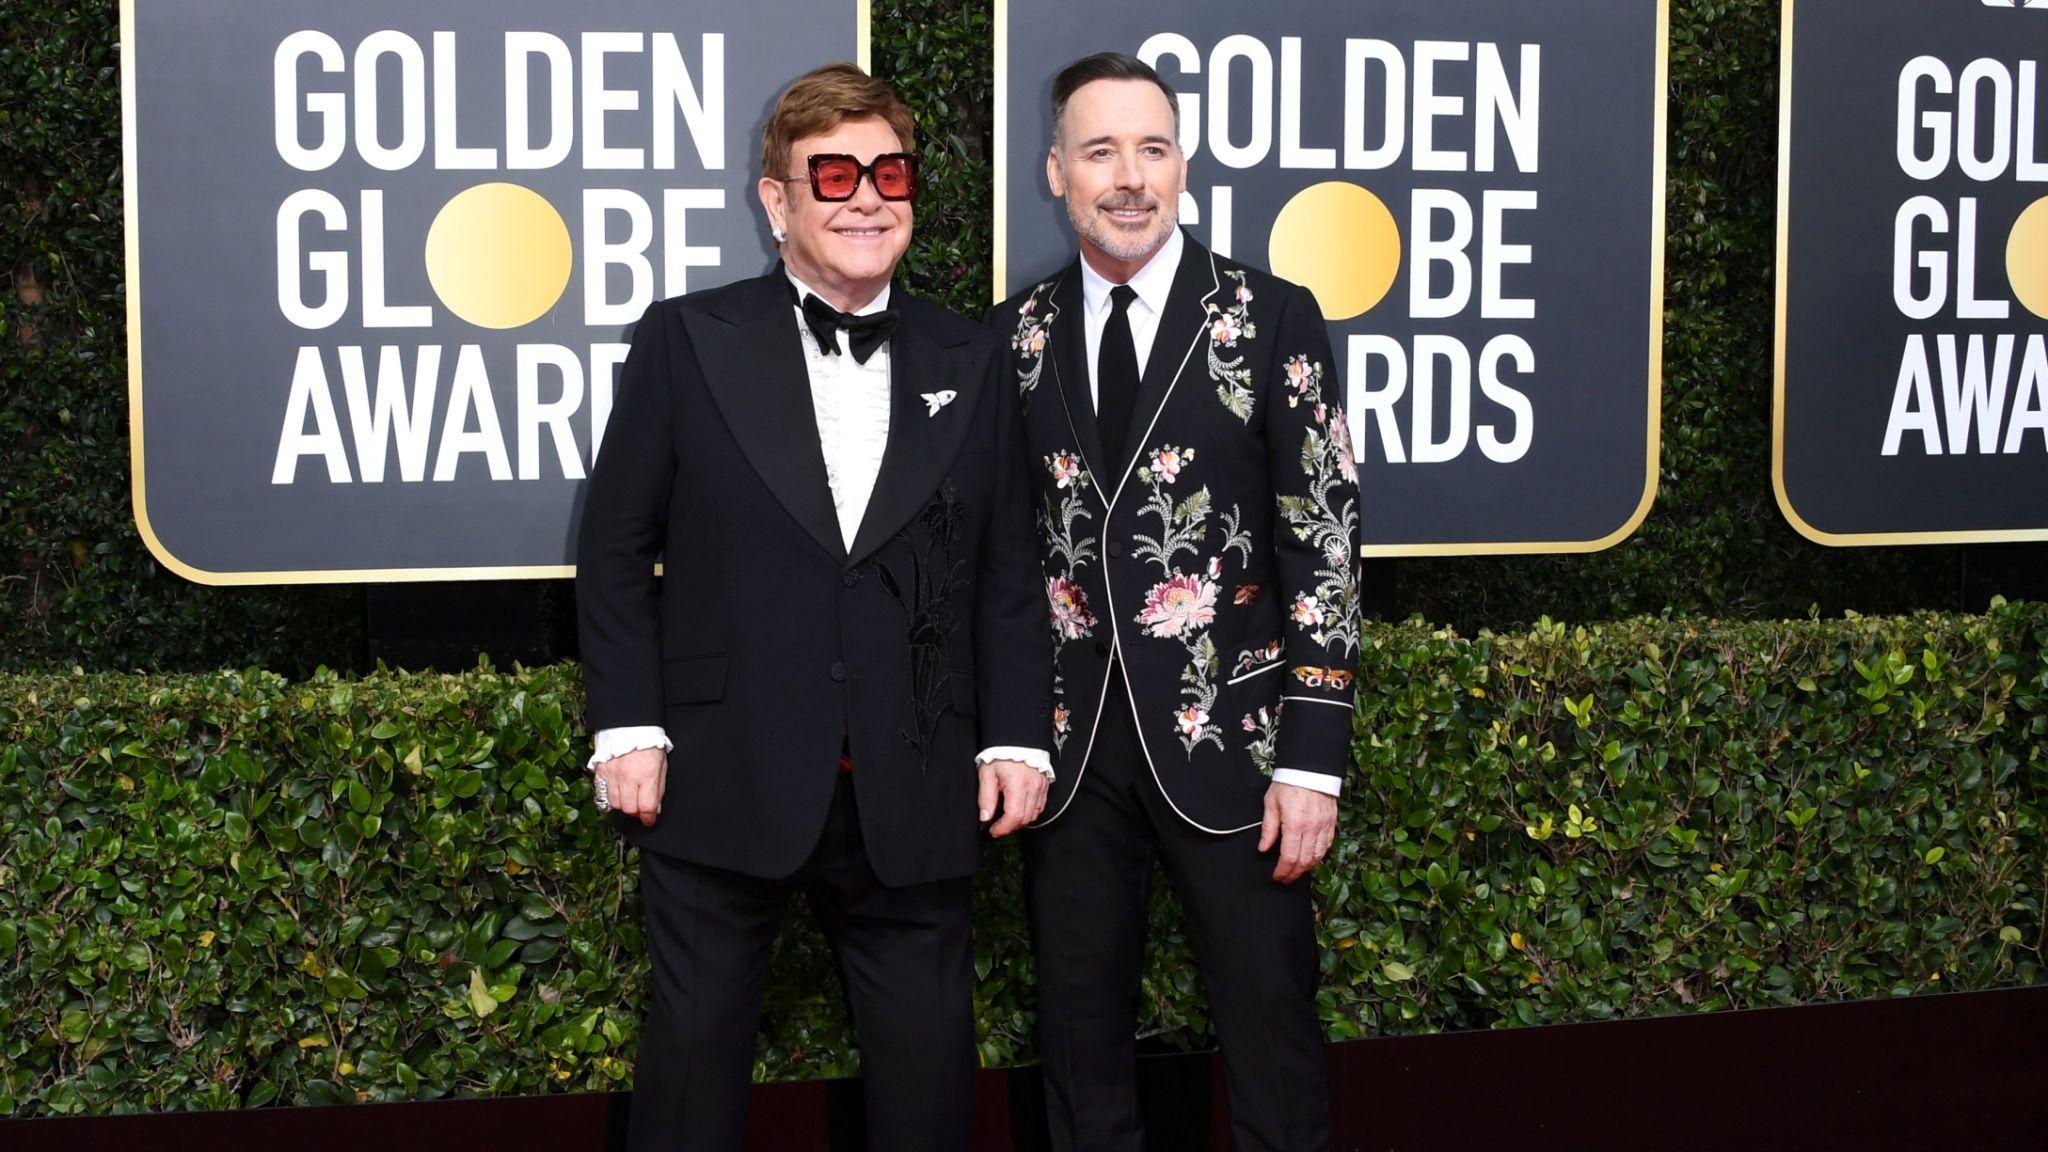 Elton John and David Furnish at the Golden Globes 2020